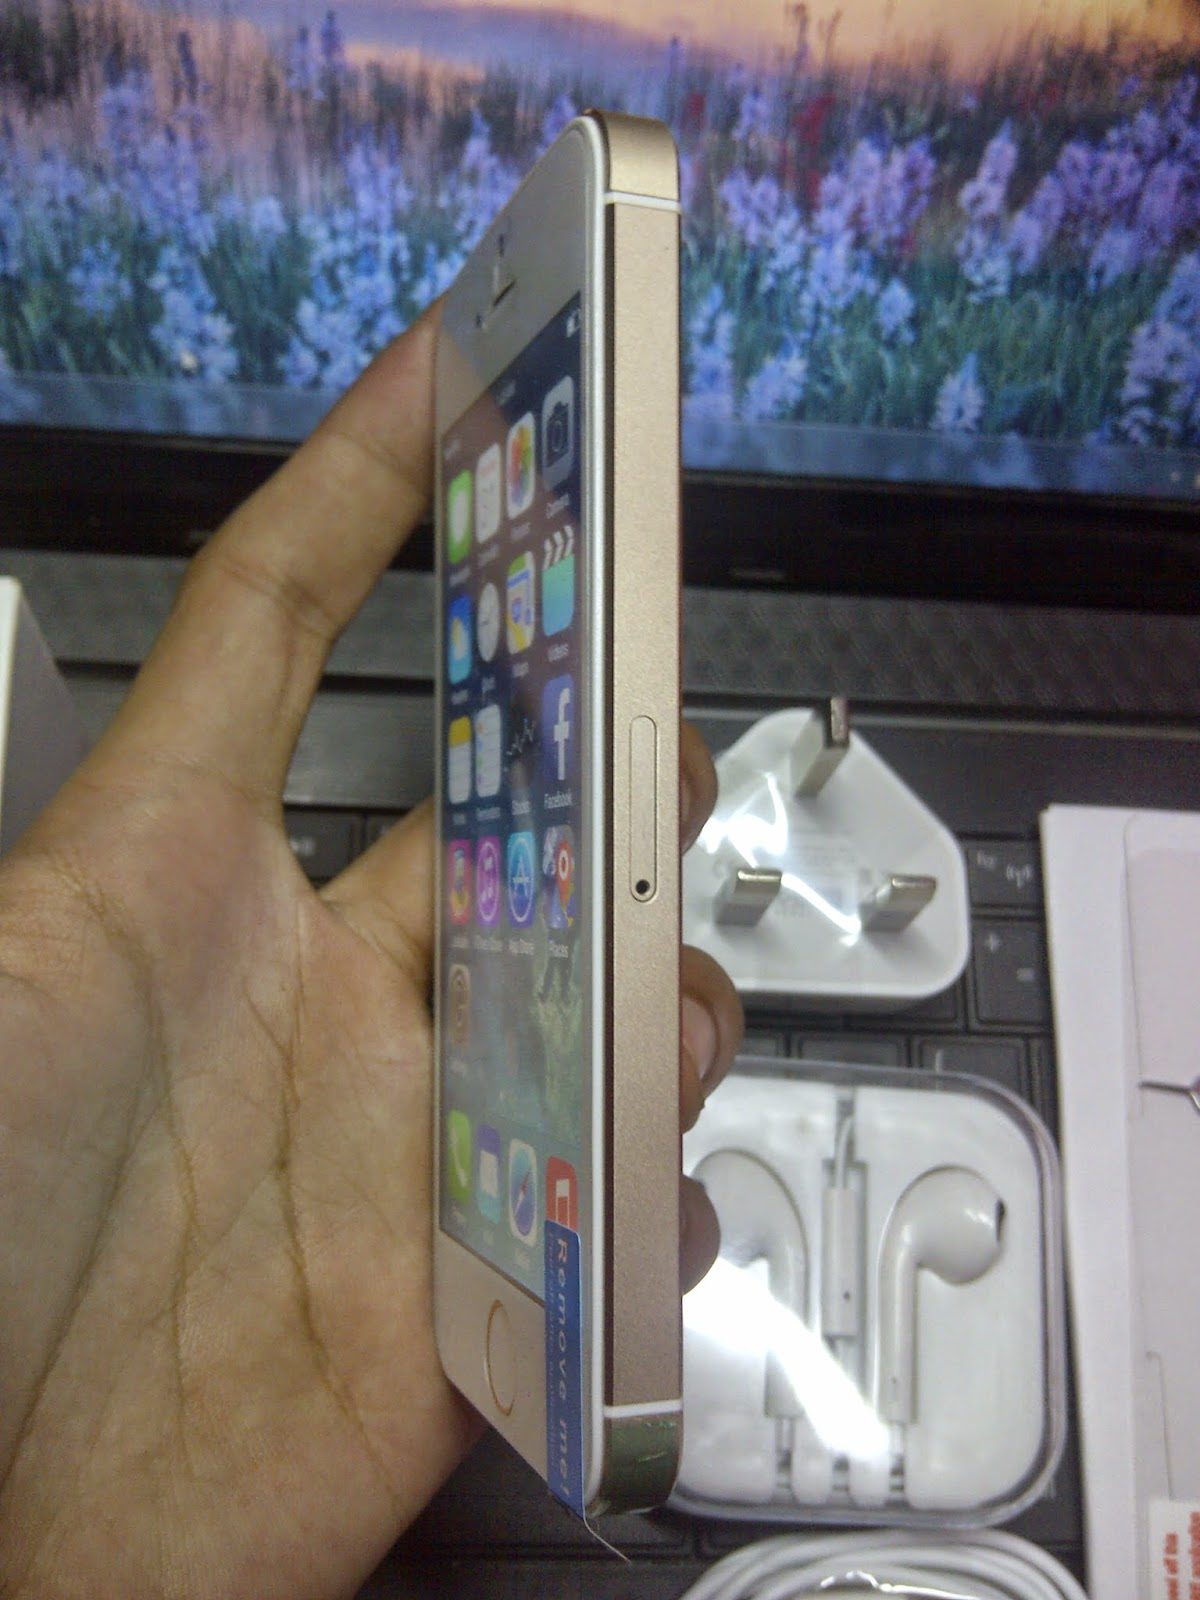 Iphone Supercopy